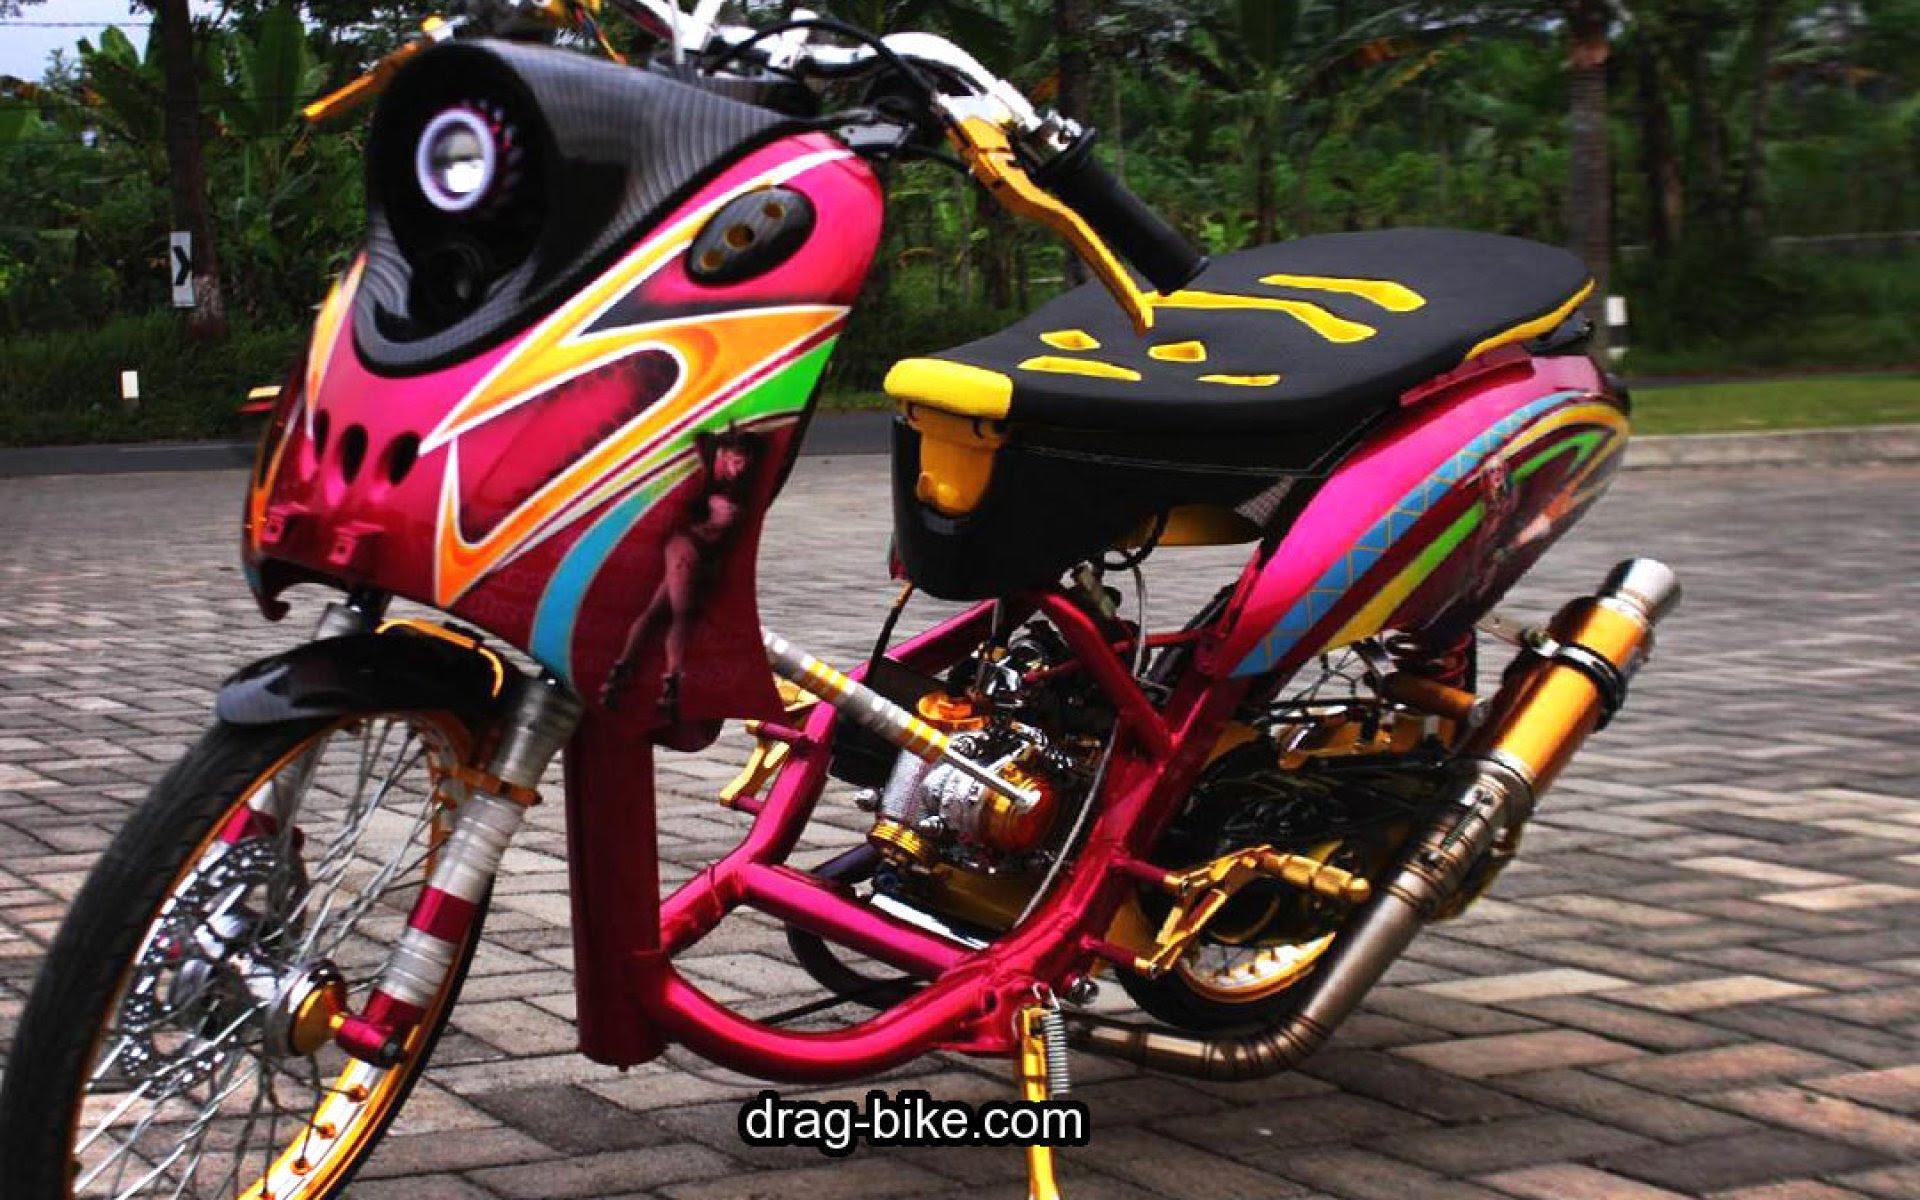 99 Gambar Motor Drag Bike Thailand Terkeren Kewak Motor